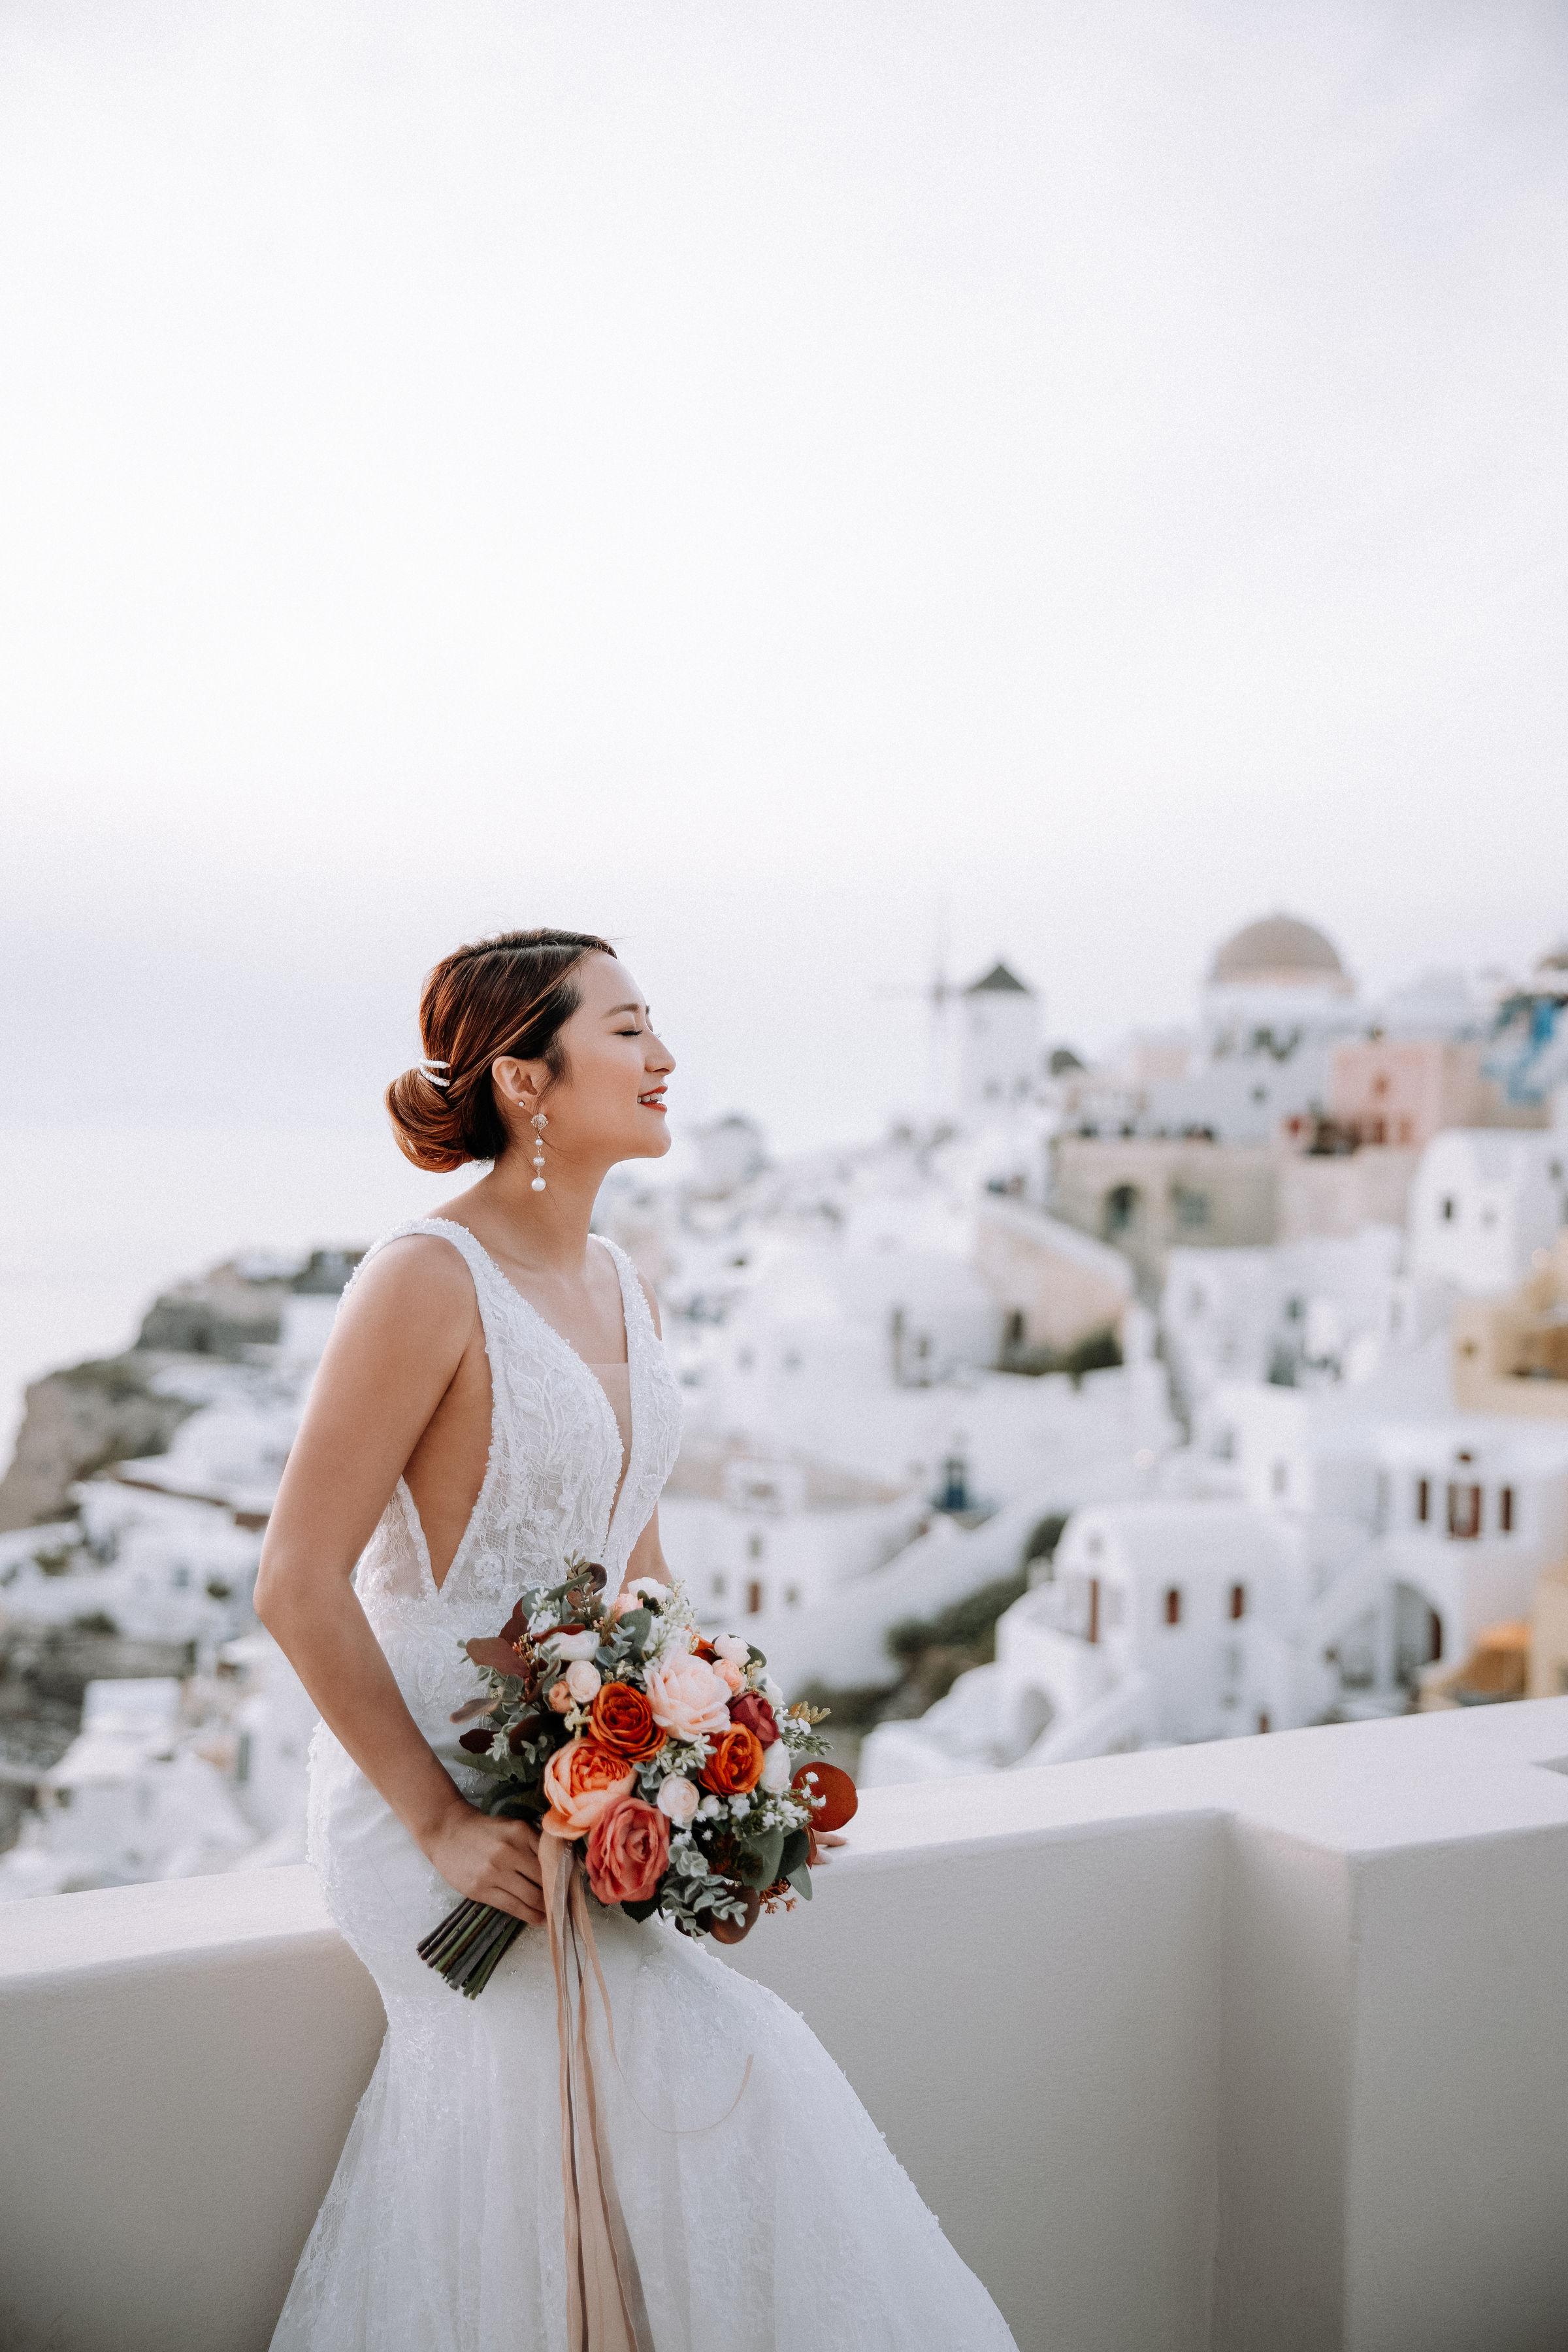 bride+bespoke+v+neck+lace+wedding+dress+ccm.jpg